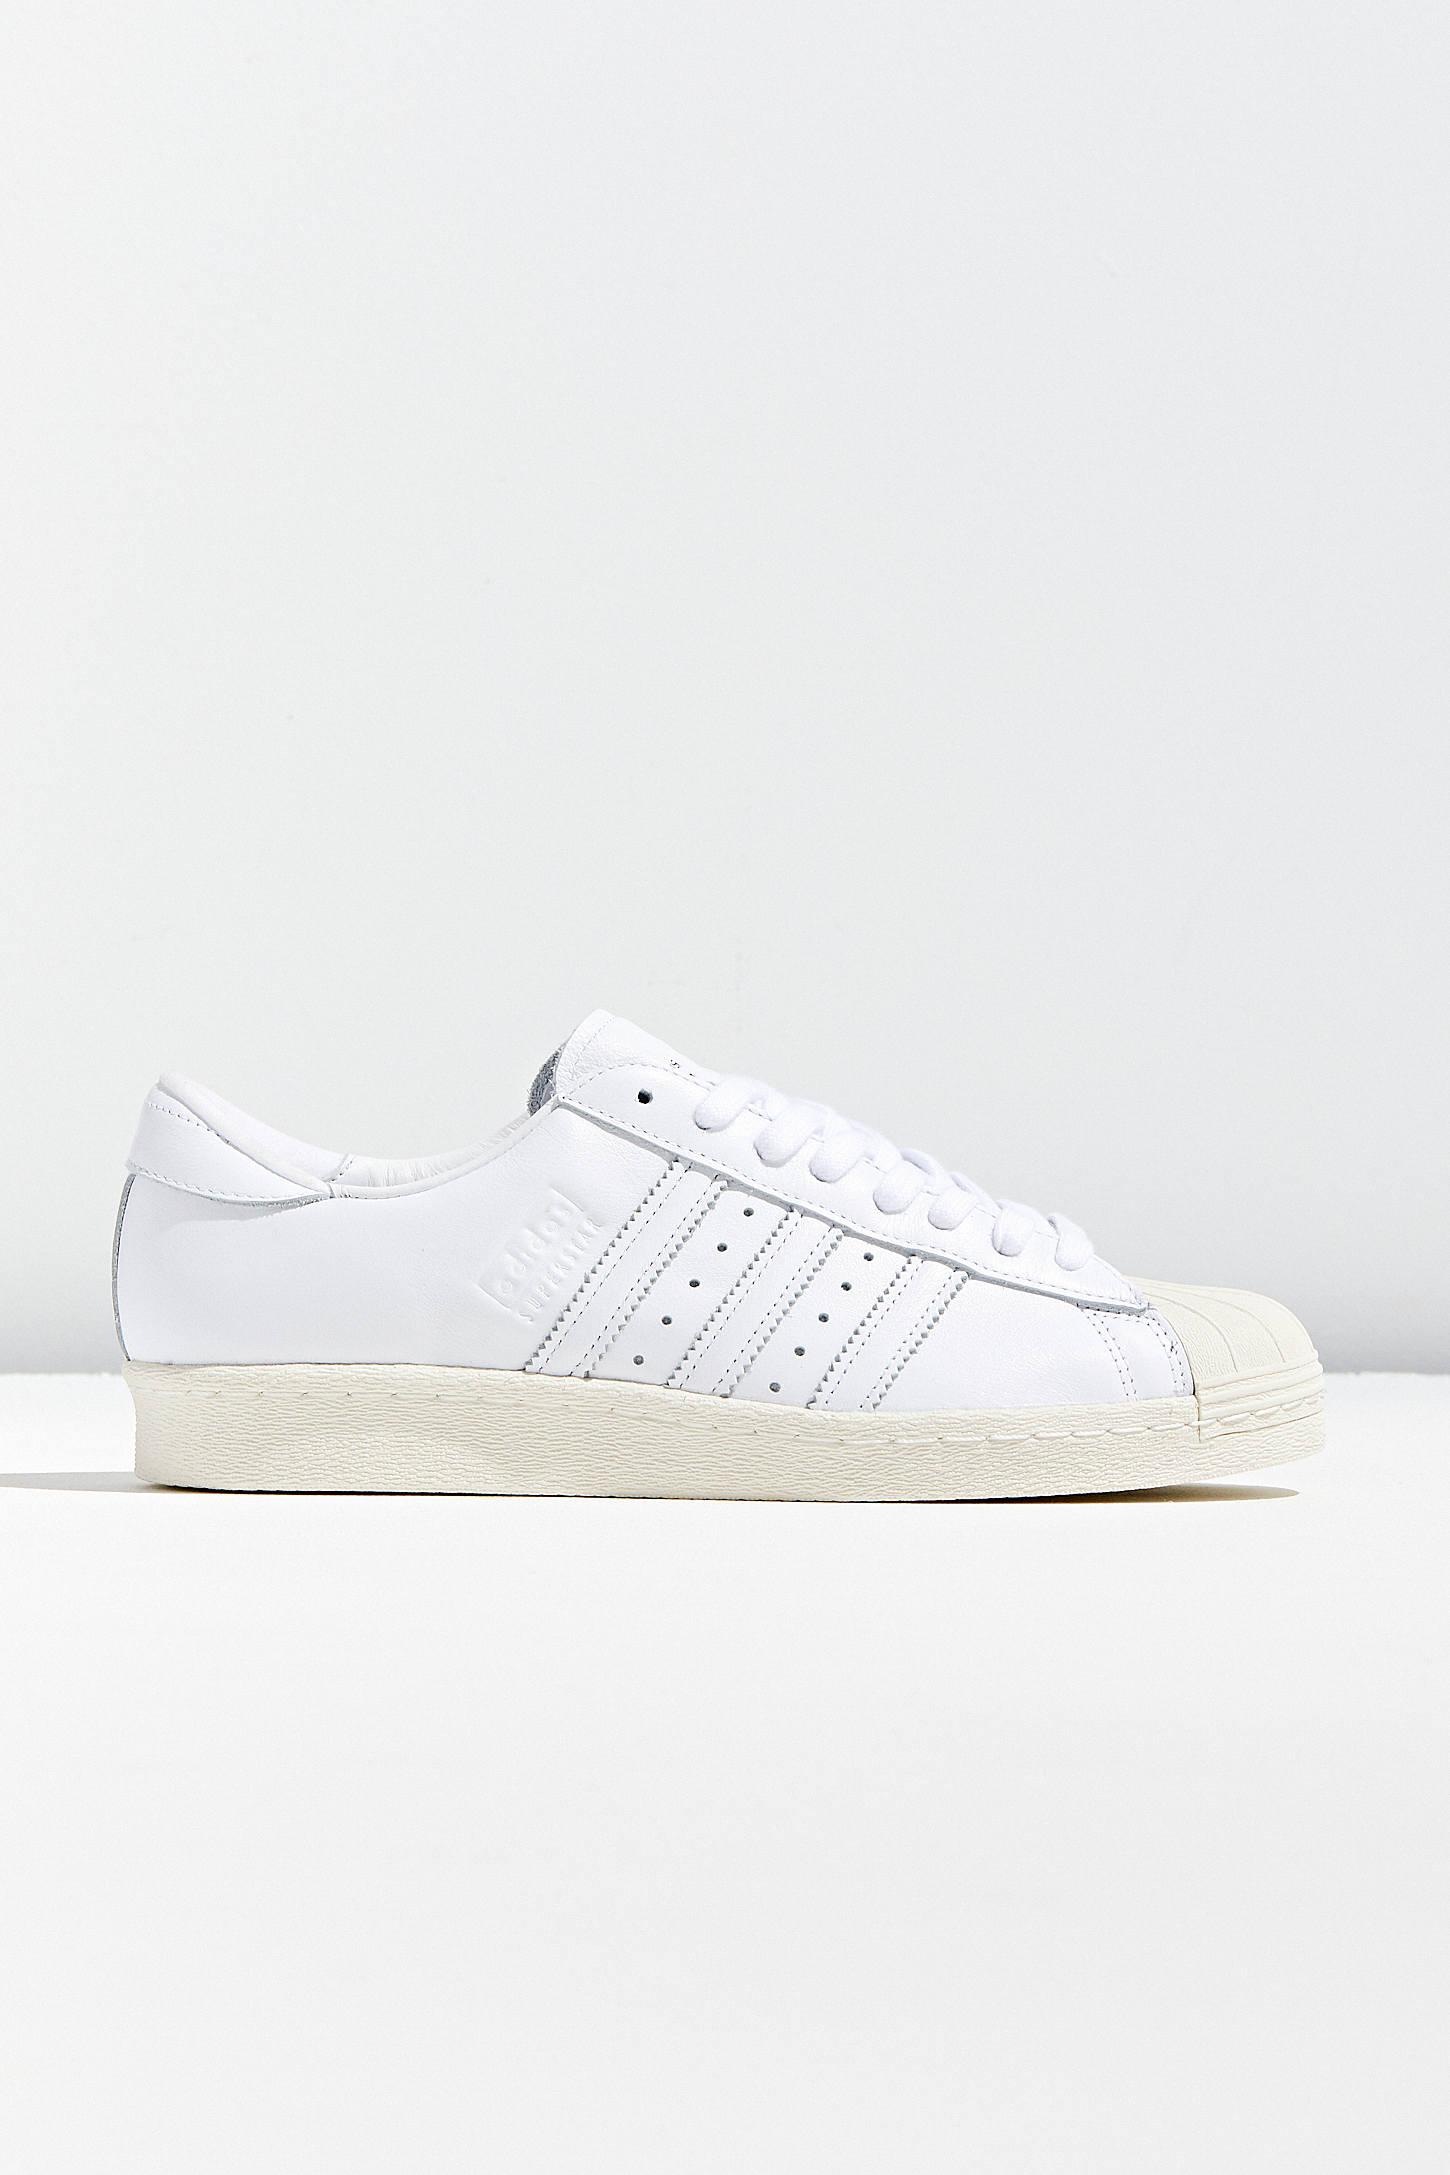 Adidas Superstar 80 Recon Sneaker